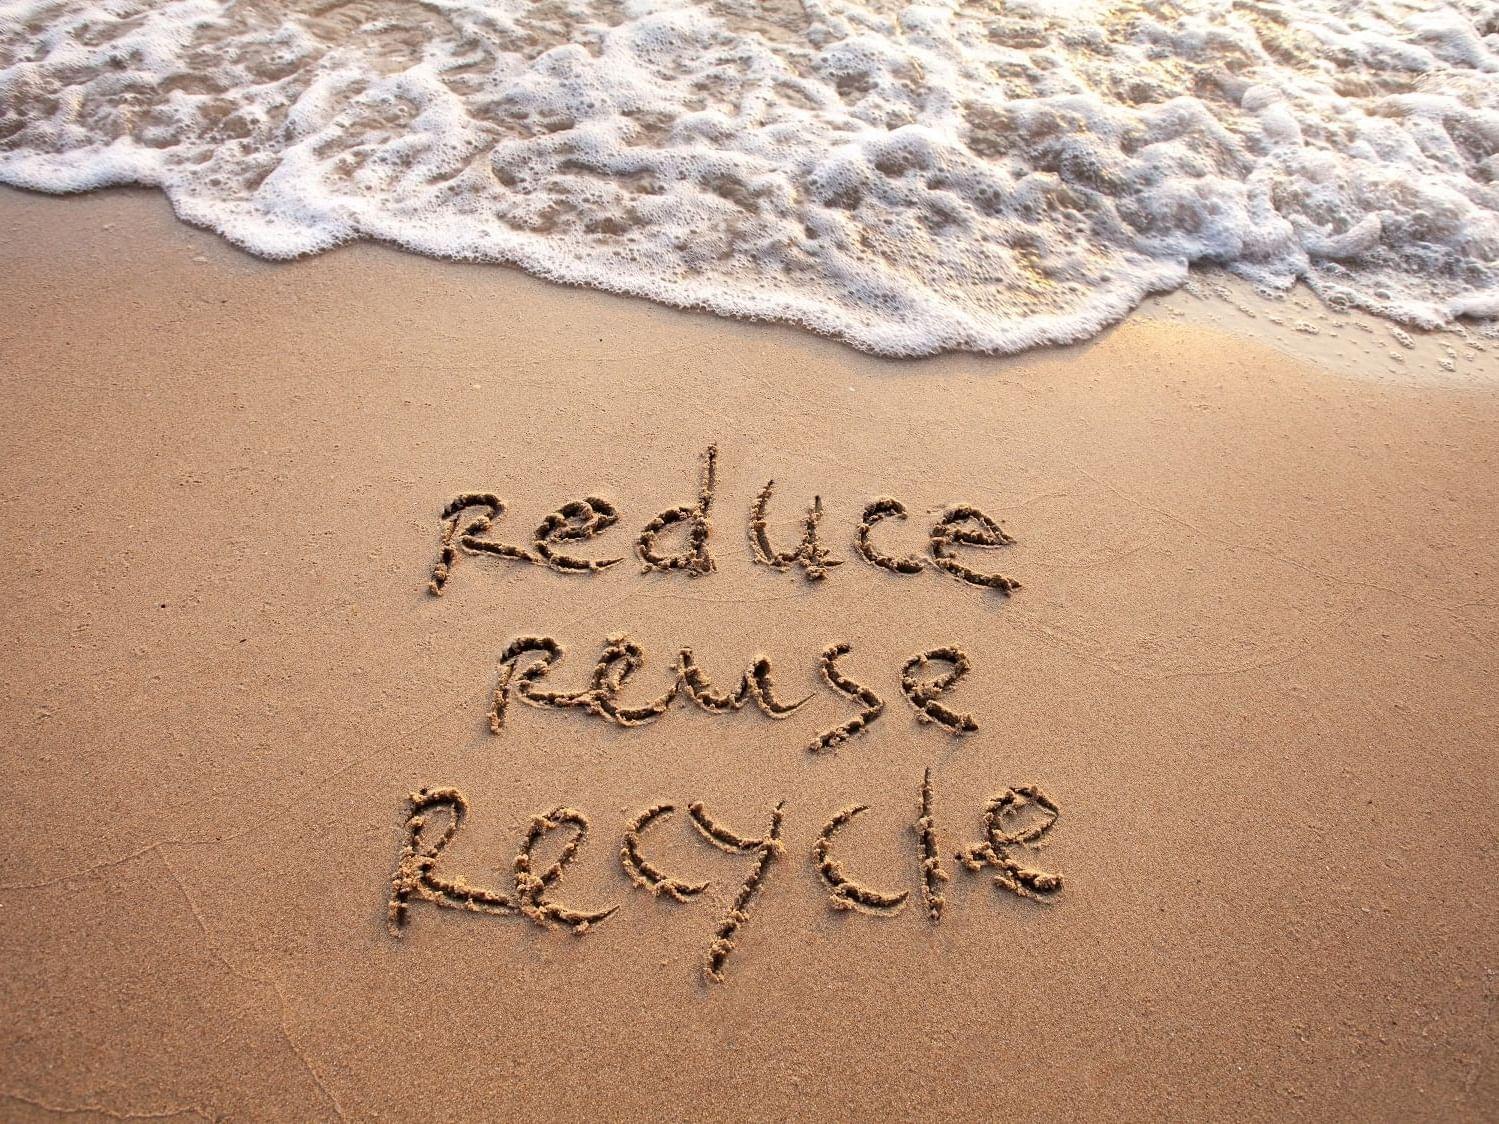 3R concept written on beach at Daydream Island Resort